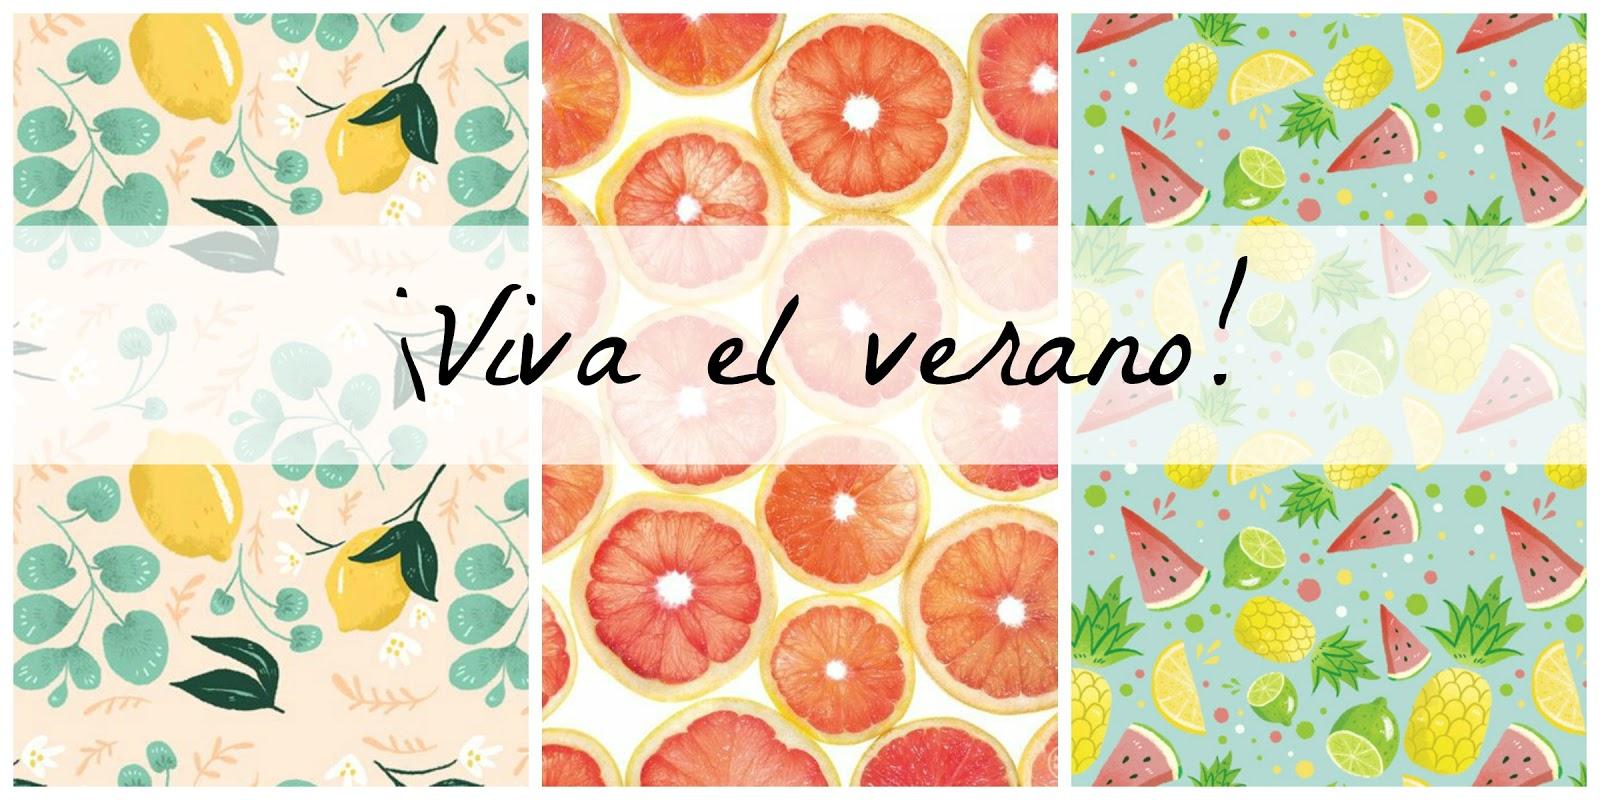 Laminas para decorar good lmina flamenco para imprimir - Laminas para decorar ...